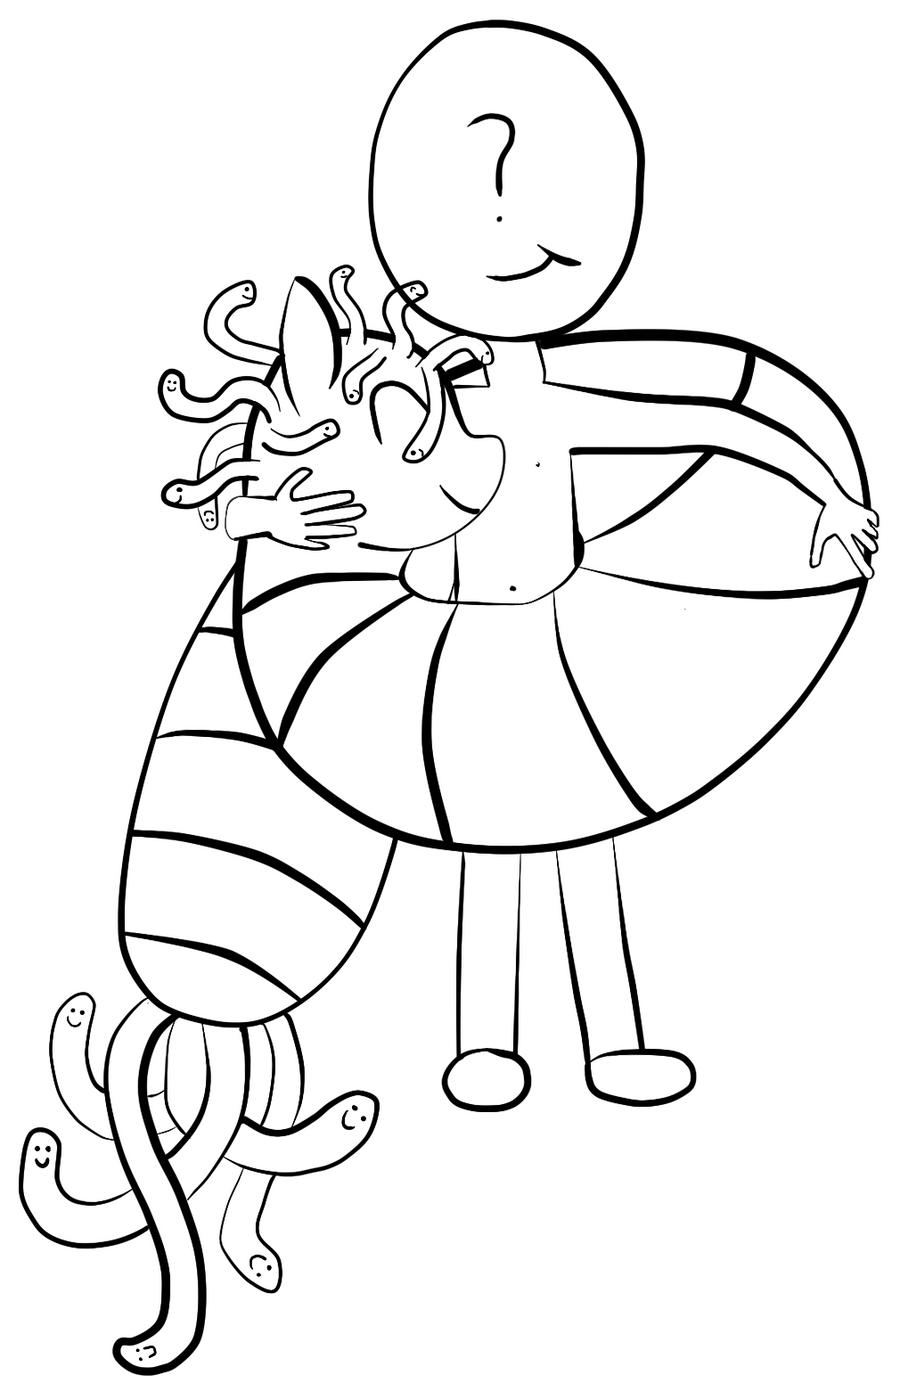 Cuddle Worm by ghanimaaa